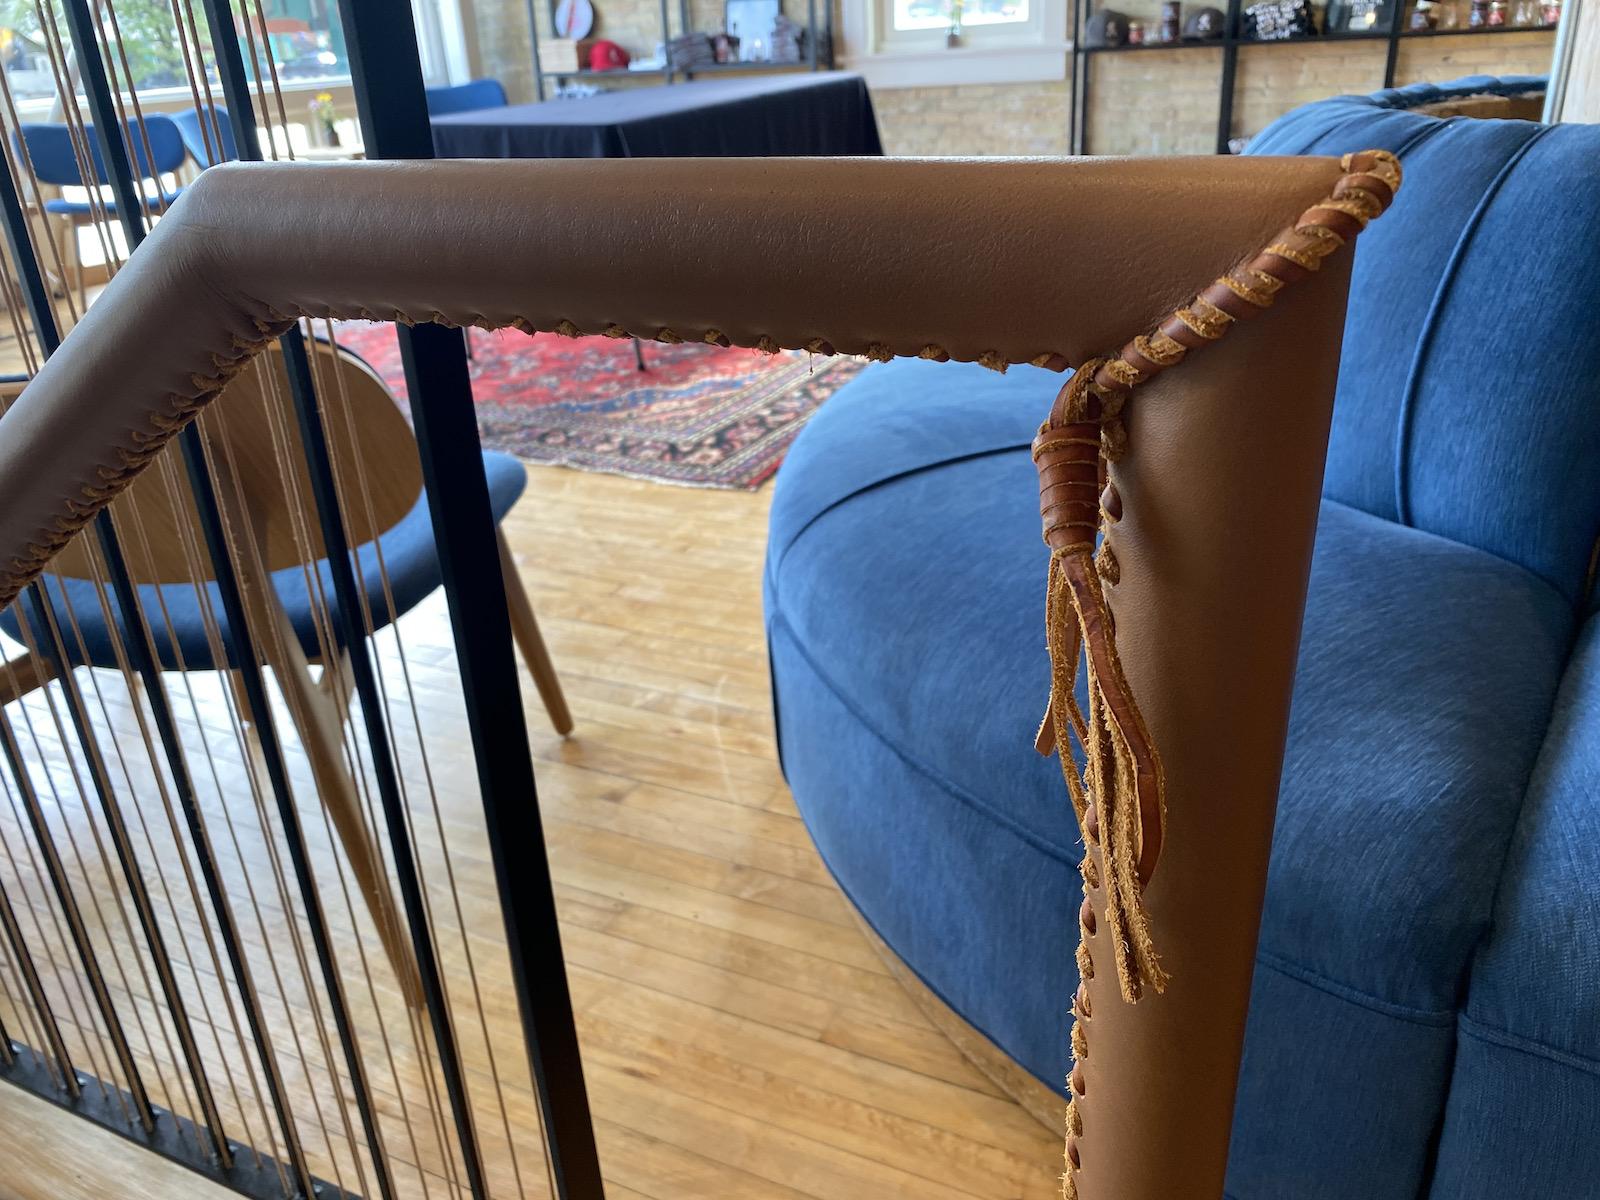 Leather railings